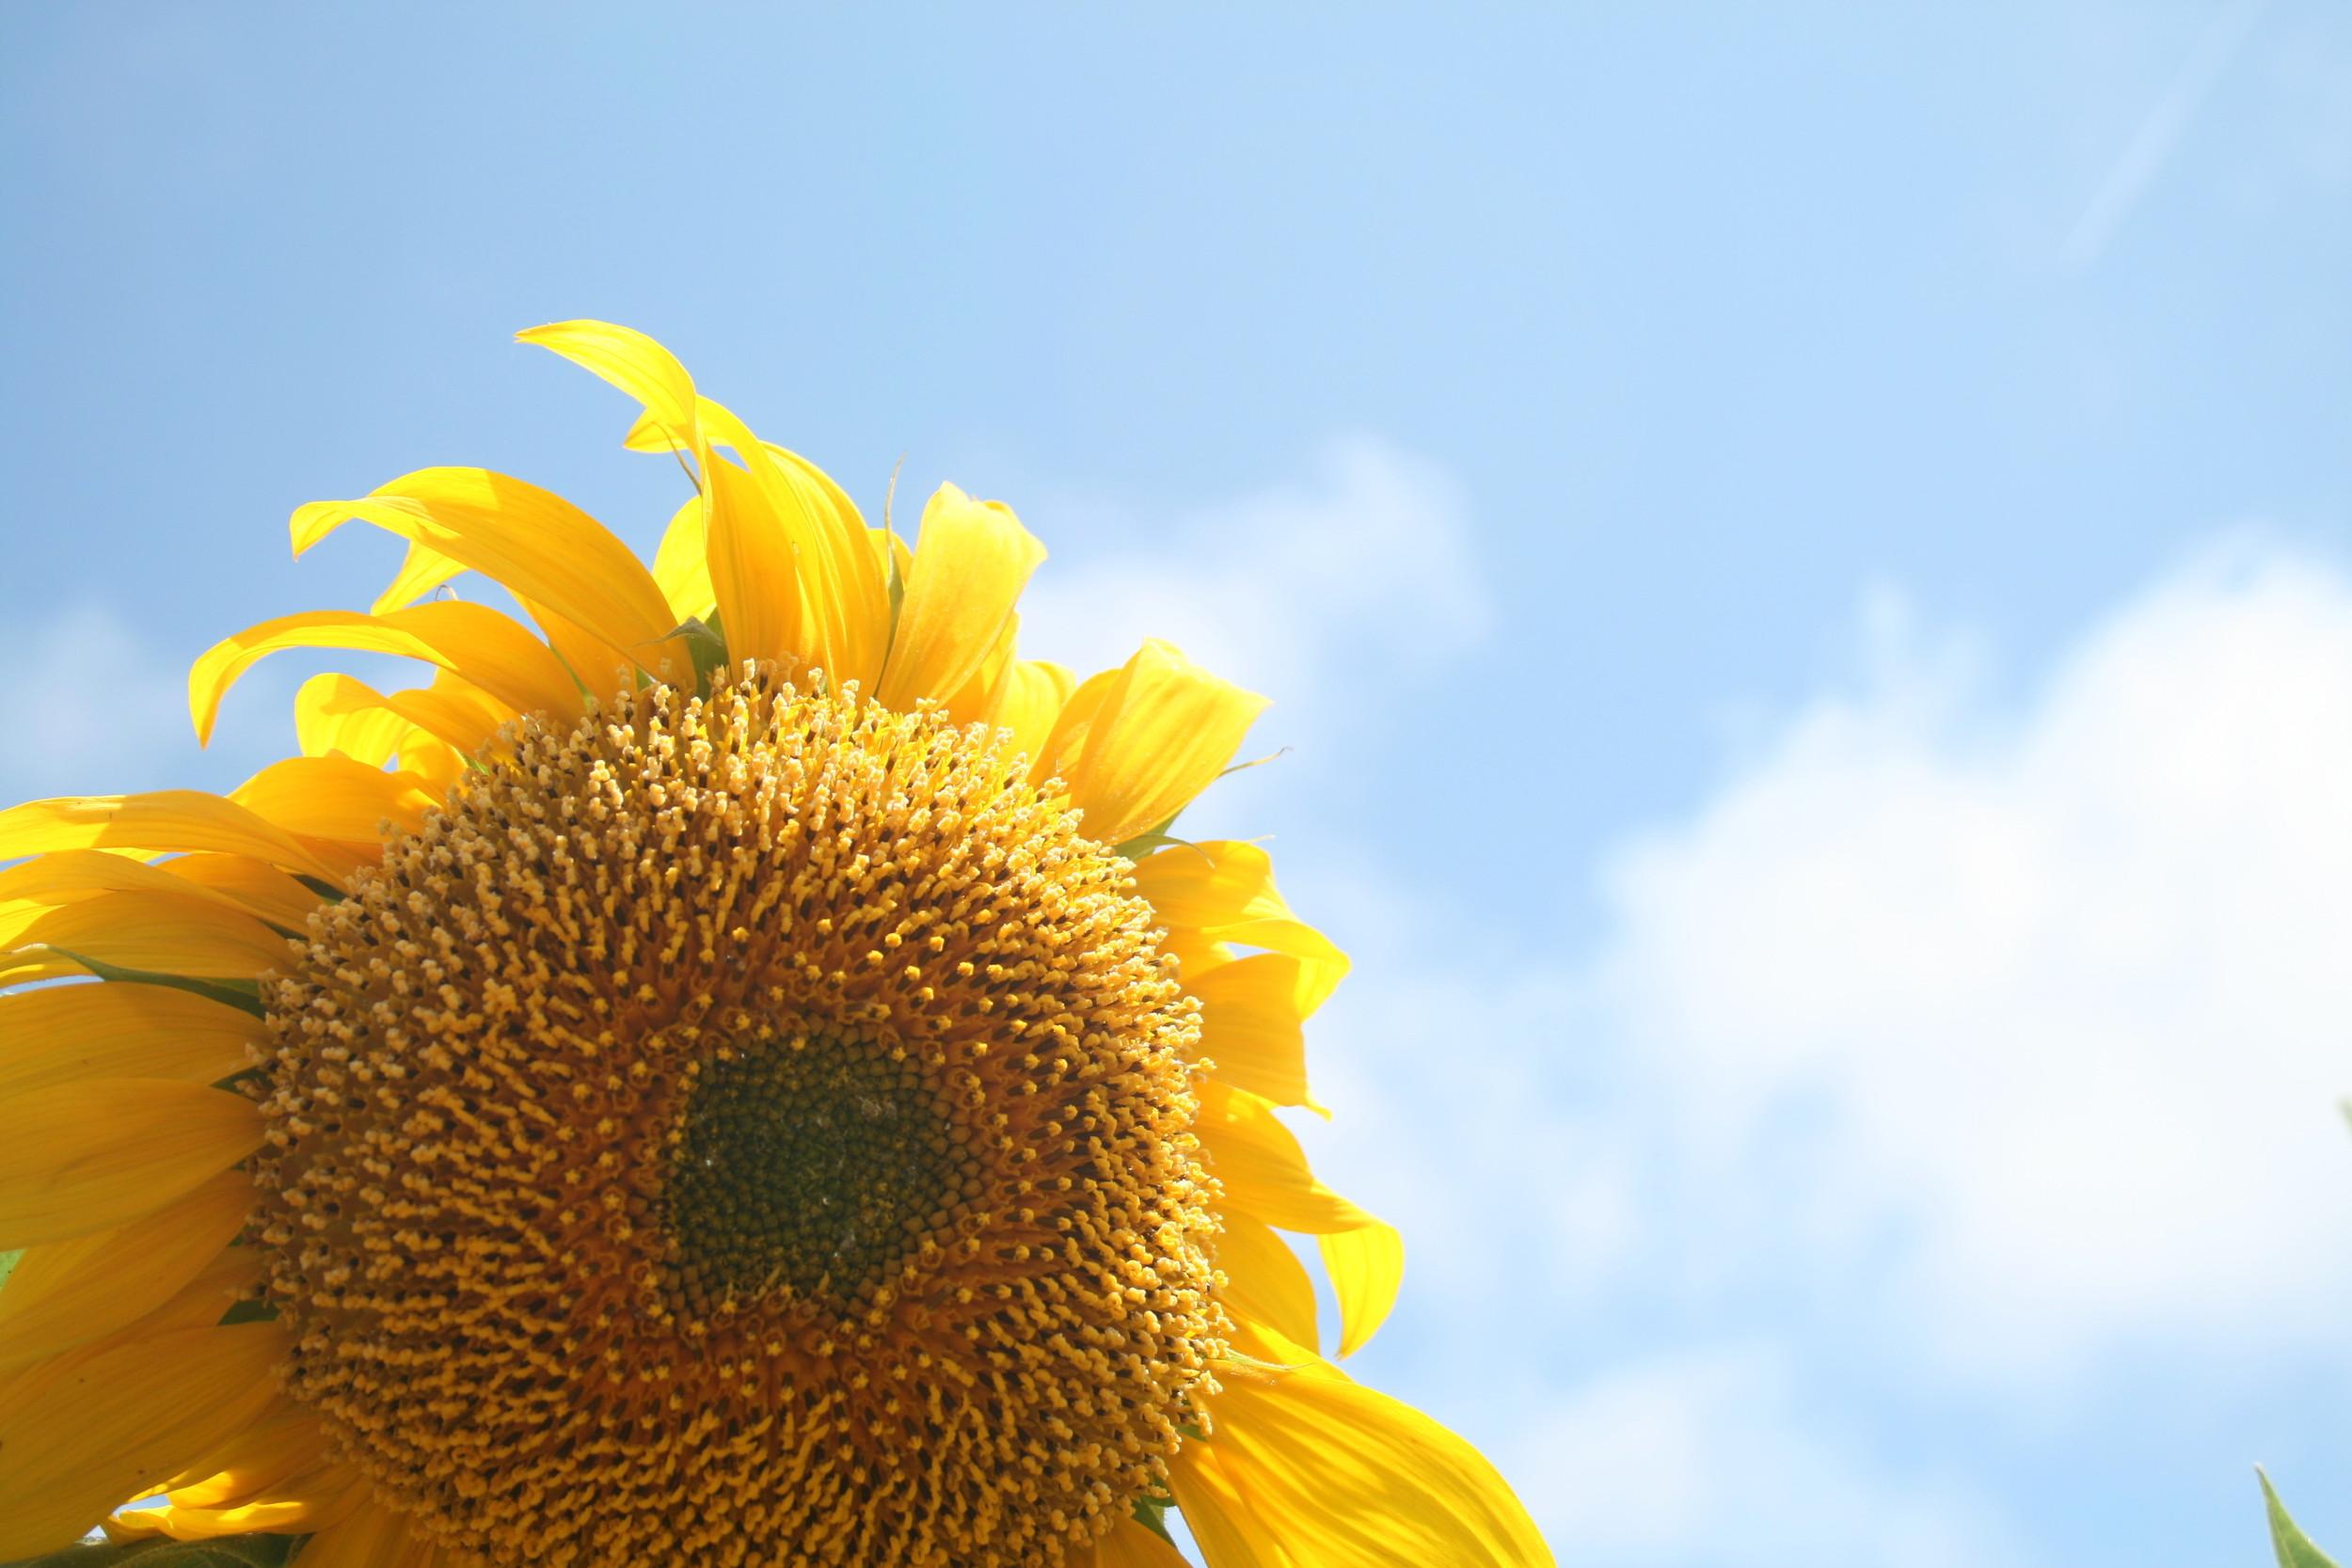 sunflower in the sky